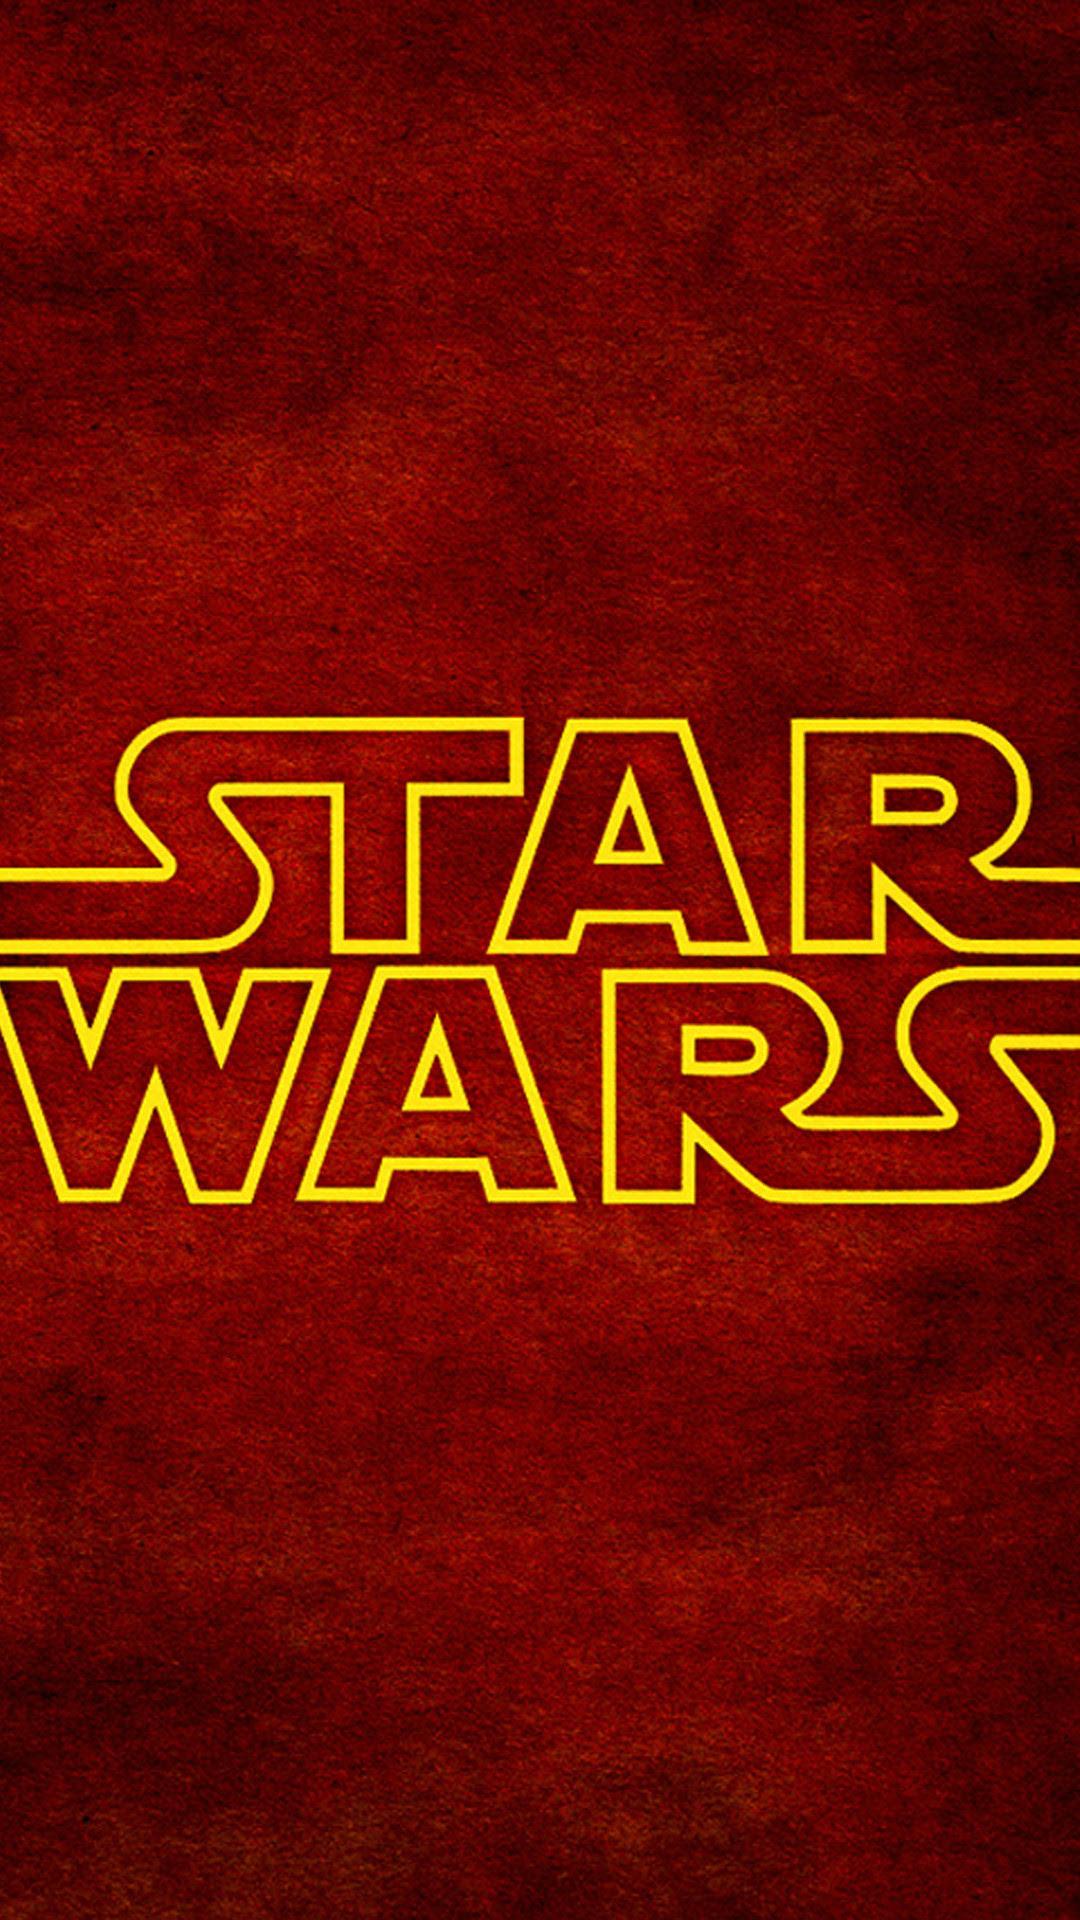 Iphone 6 Star Wars Logo Wallpaper